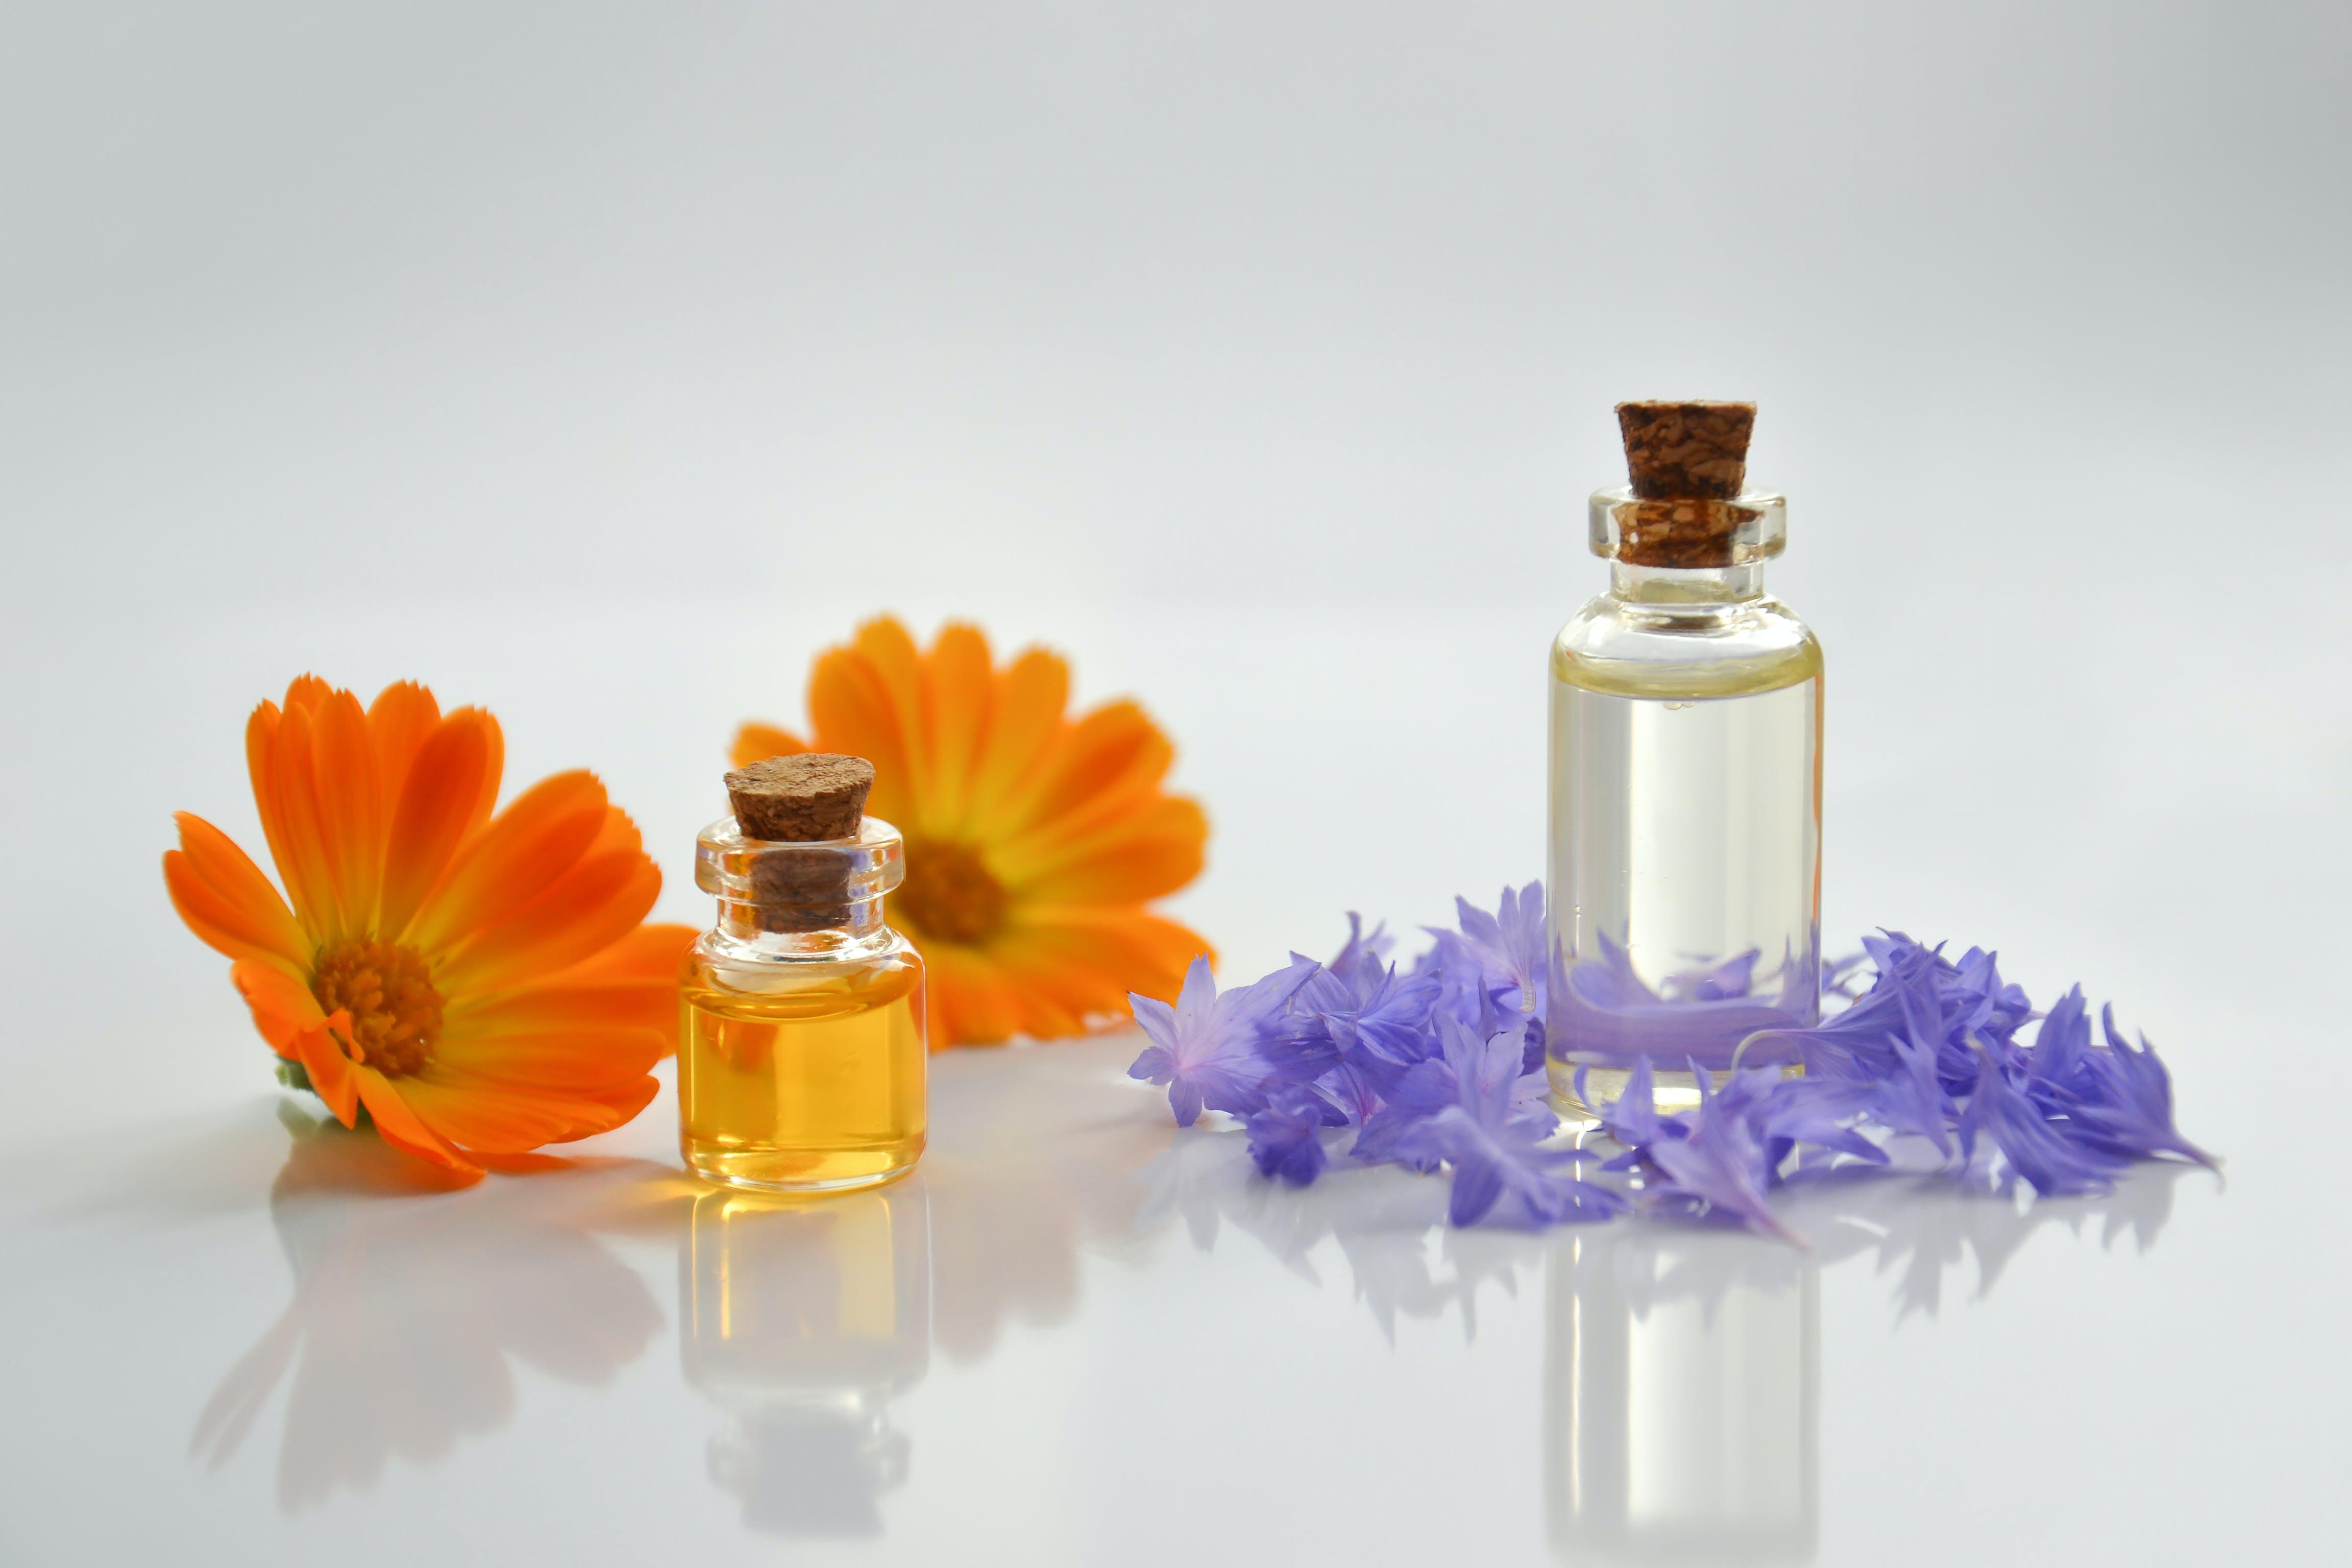 Kostenloses Stock Foto zu альтернатива, ароматерапия, духи, лекарственное средство